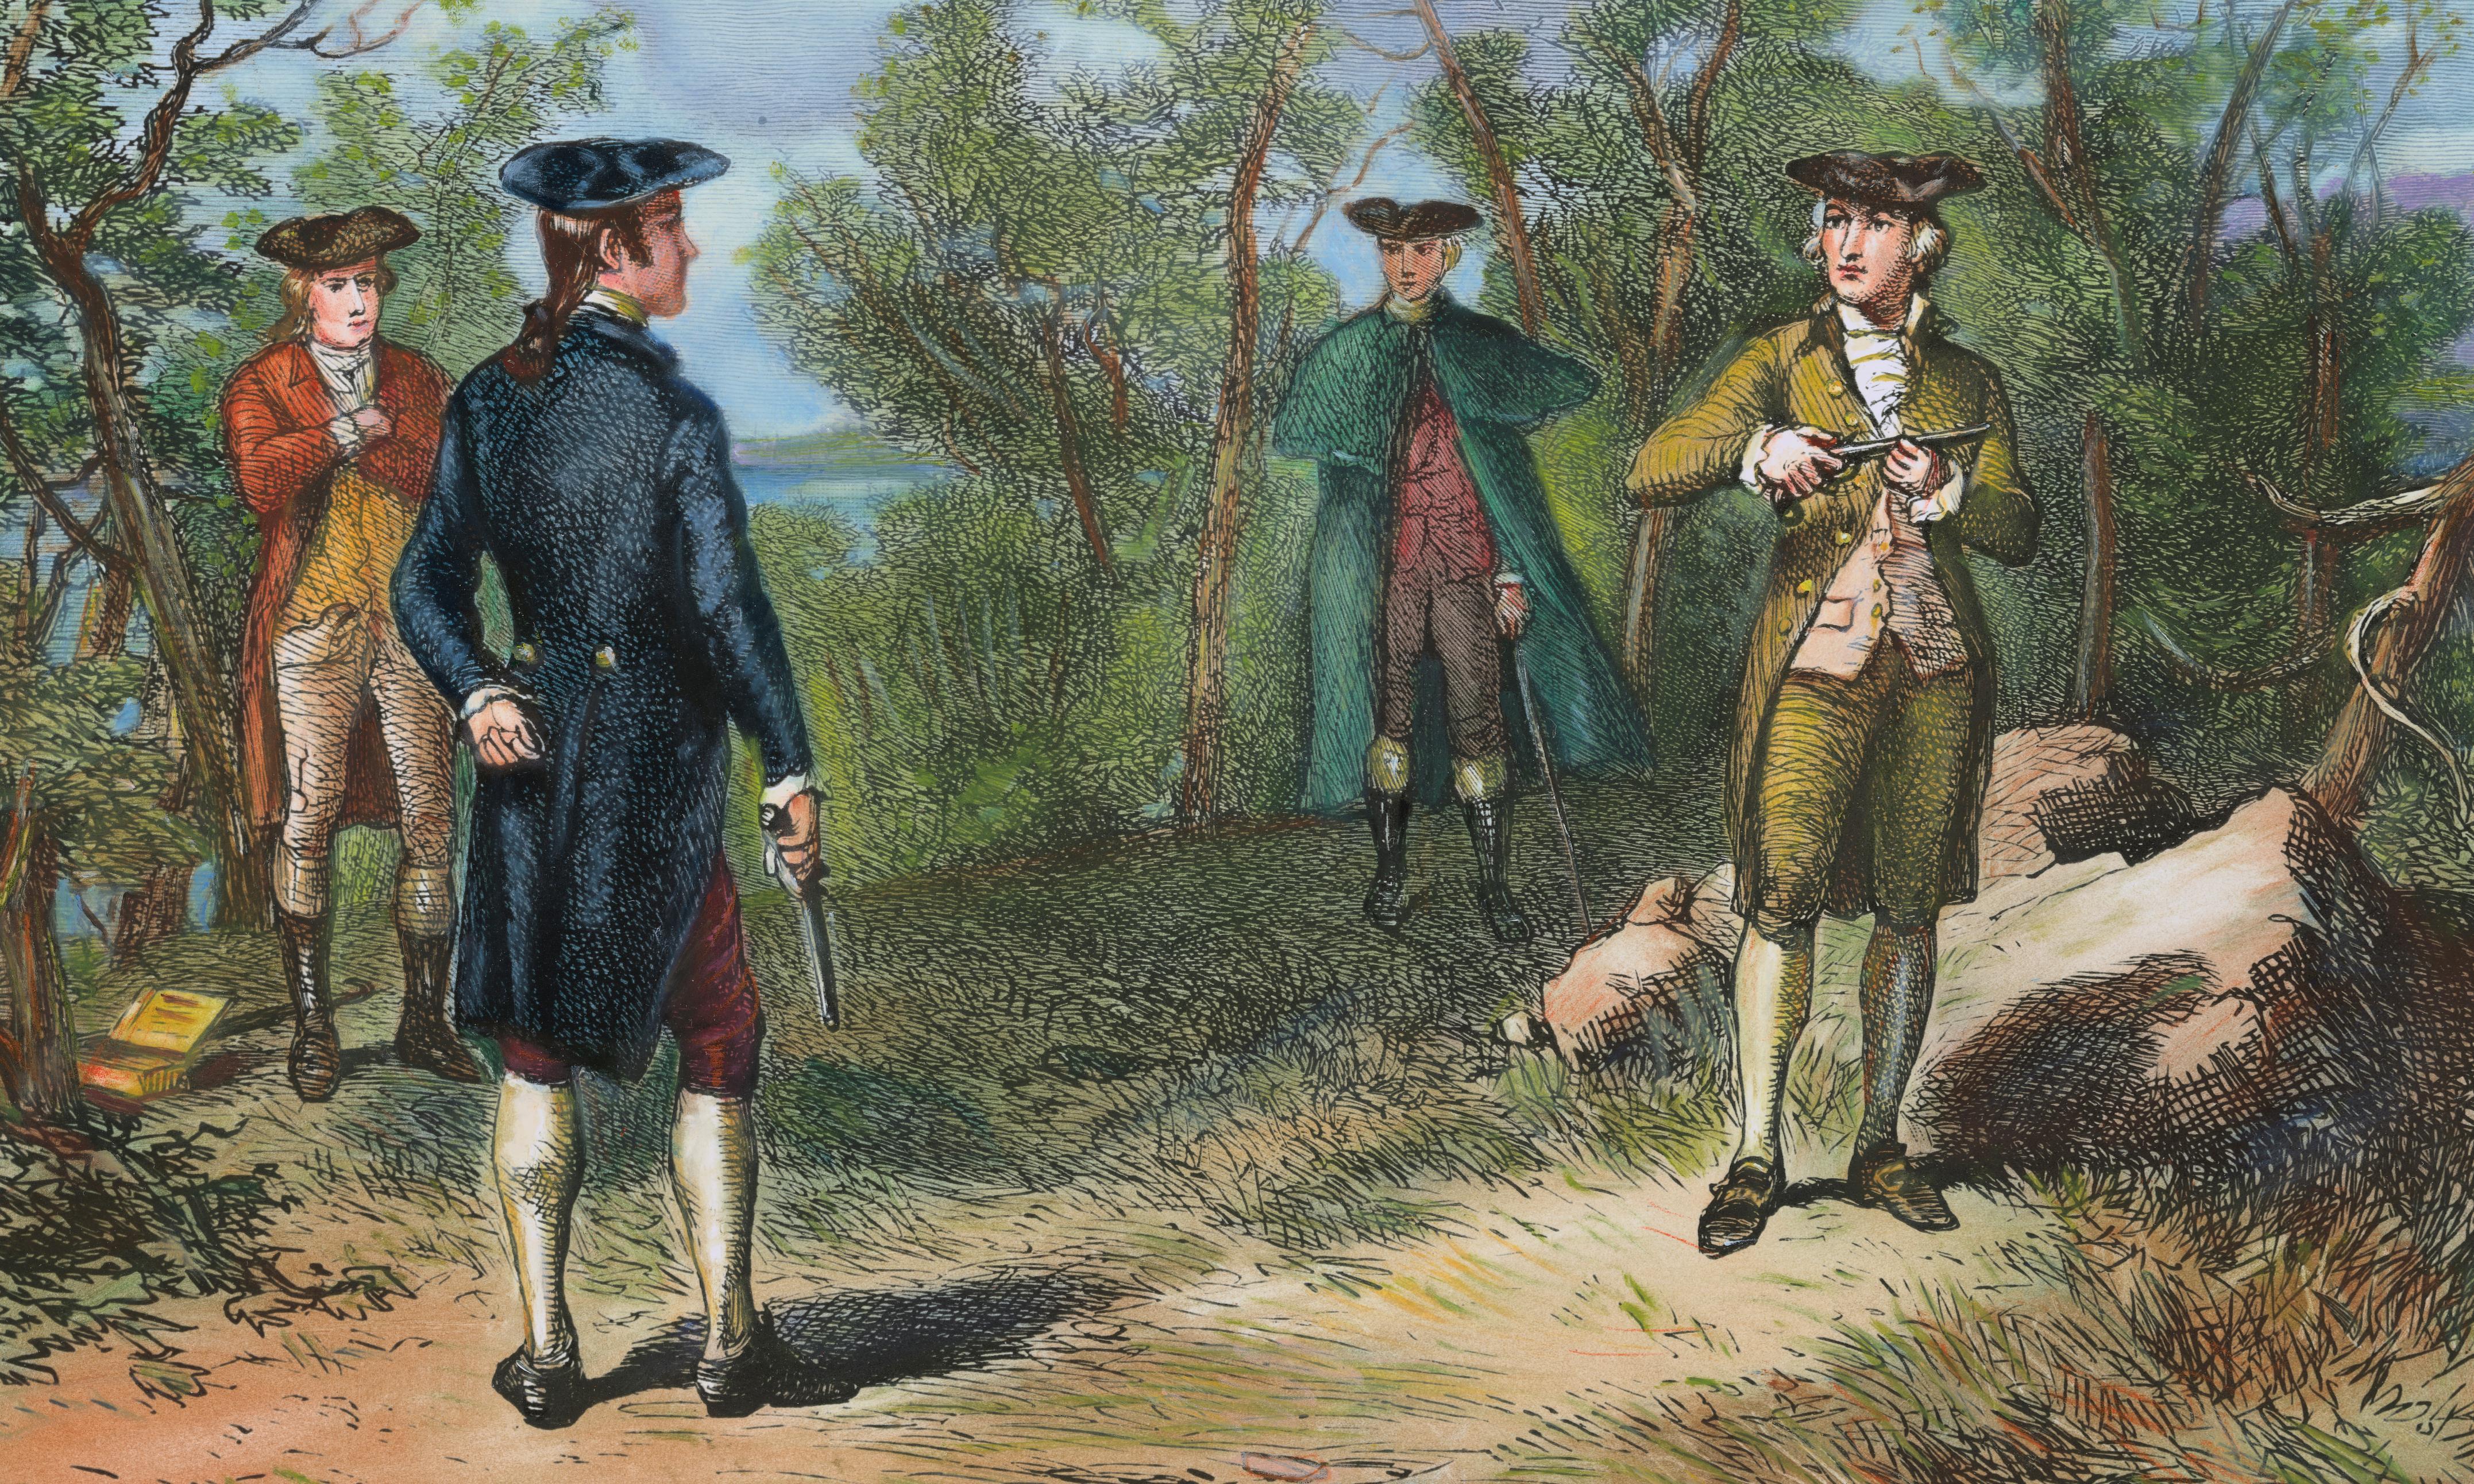 Aaron Burr, vice-president who killed Hamilton, had children of color